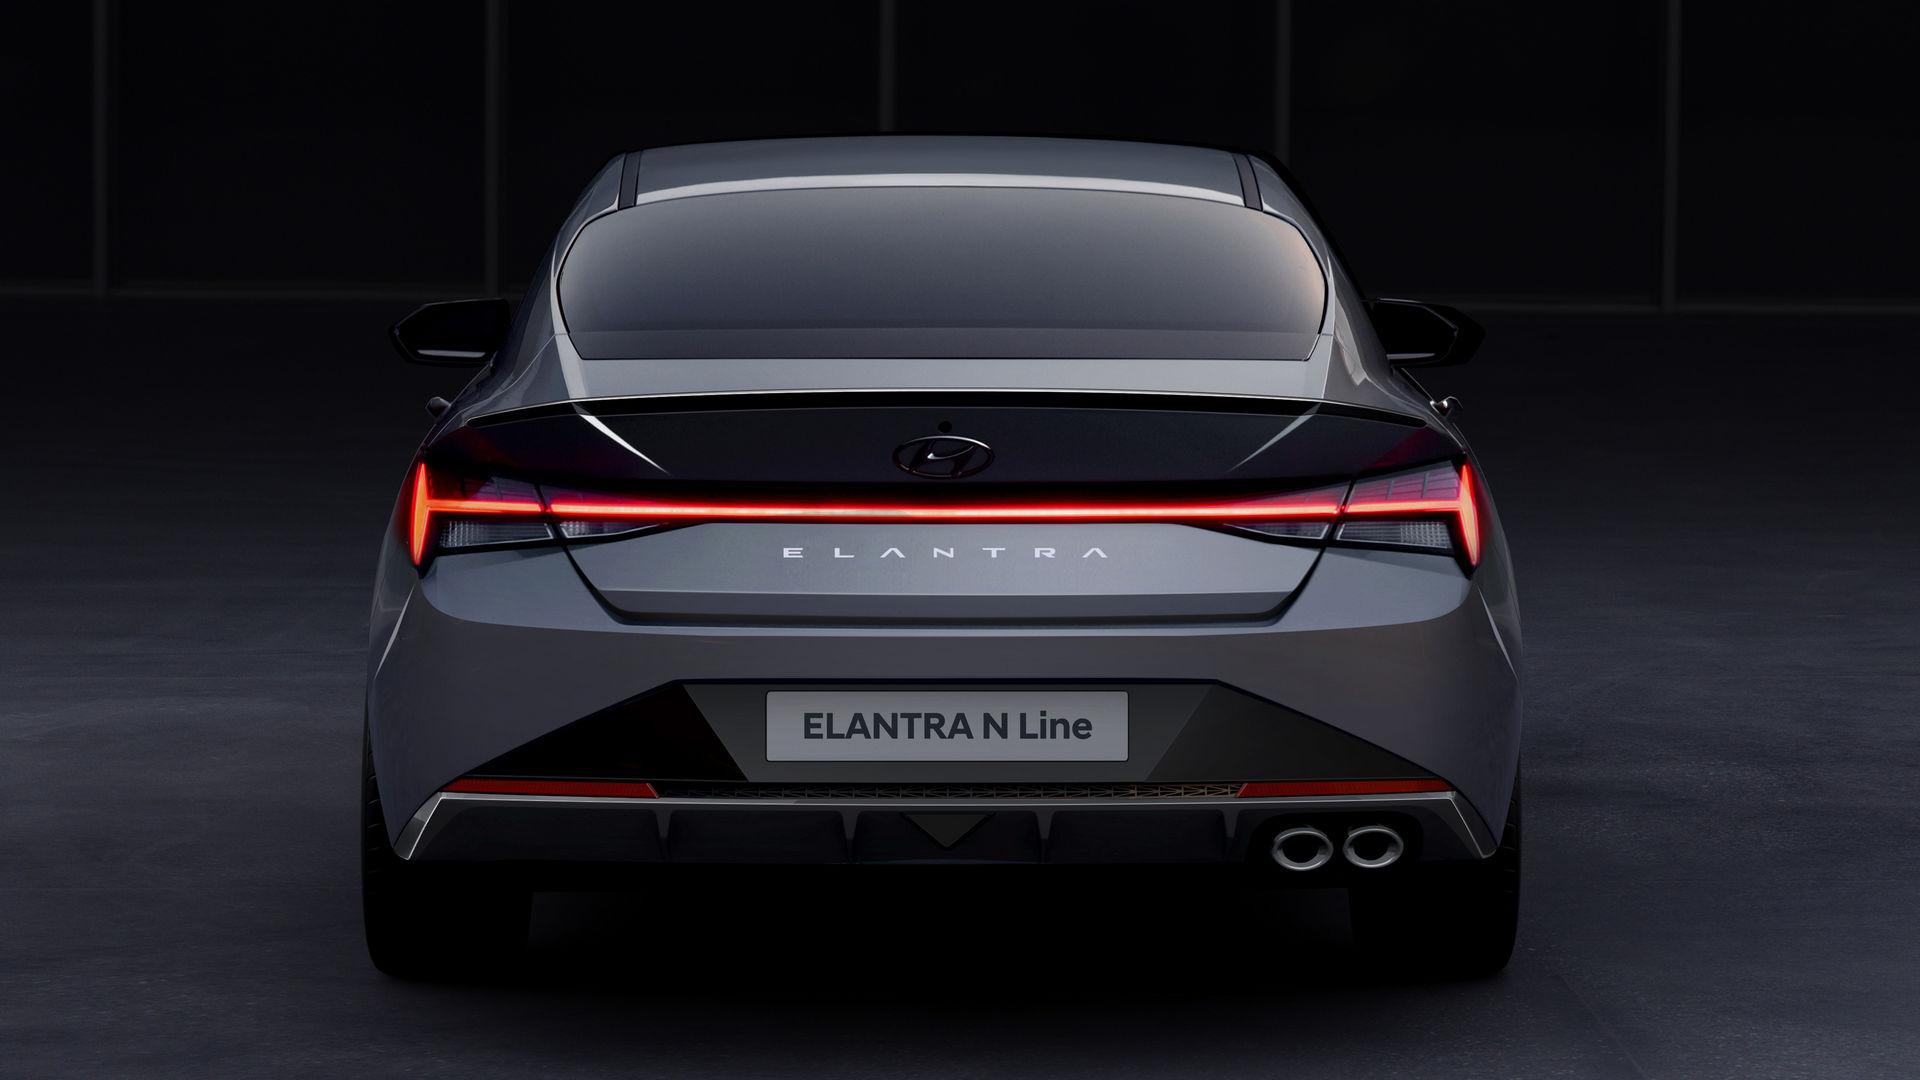 Hyundai-Elantra-N-Line-2021-3